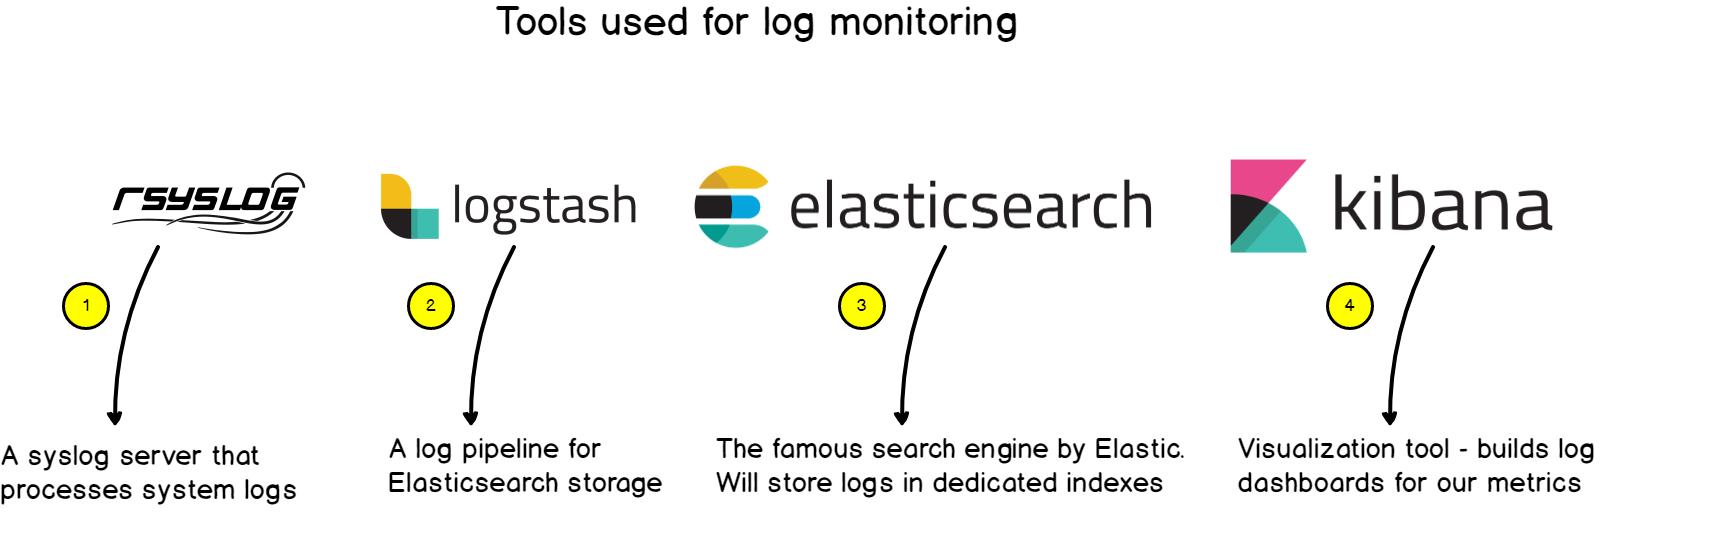 tools-for-log-monitoring